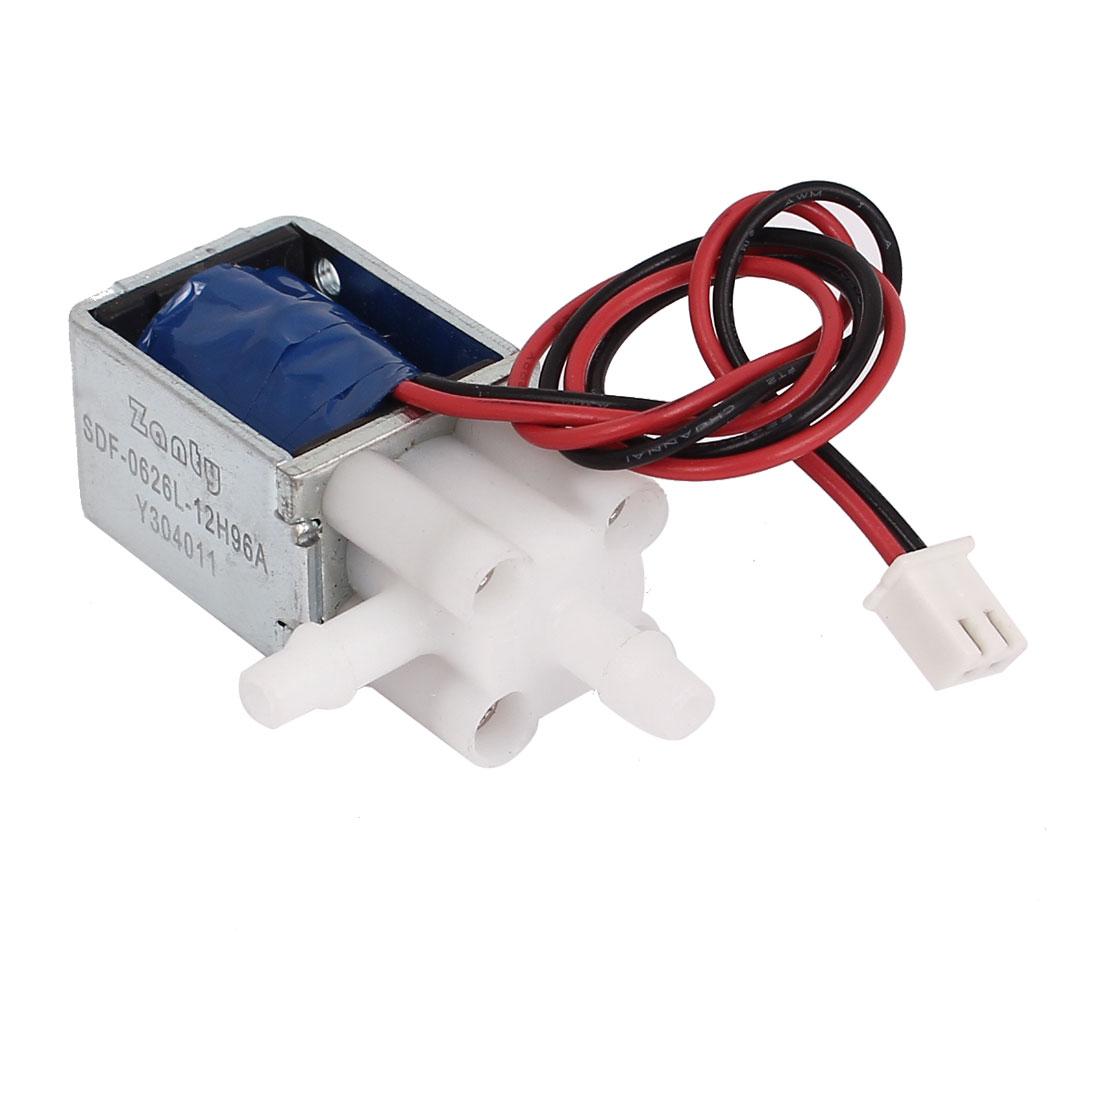 8-2-Pin-Connecting-2-Outlet-Electromagnet-Solenoid-Valve-DC-12V-1-5W